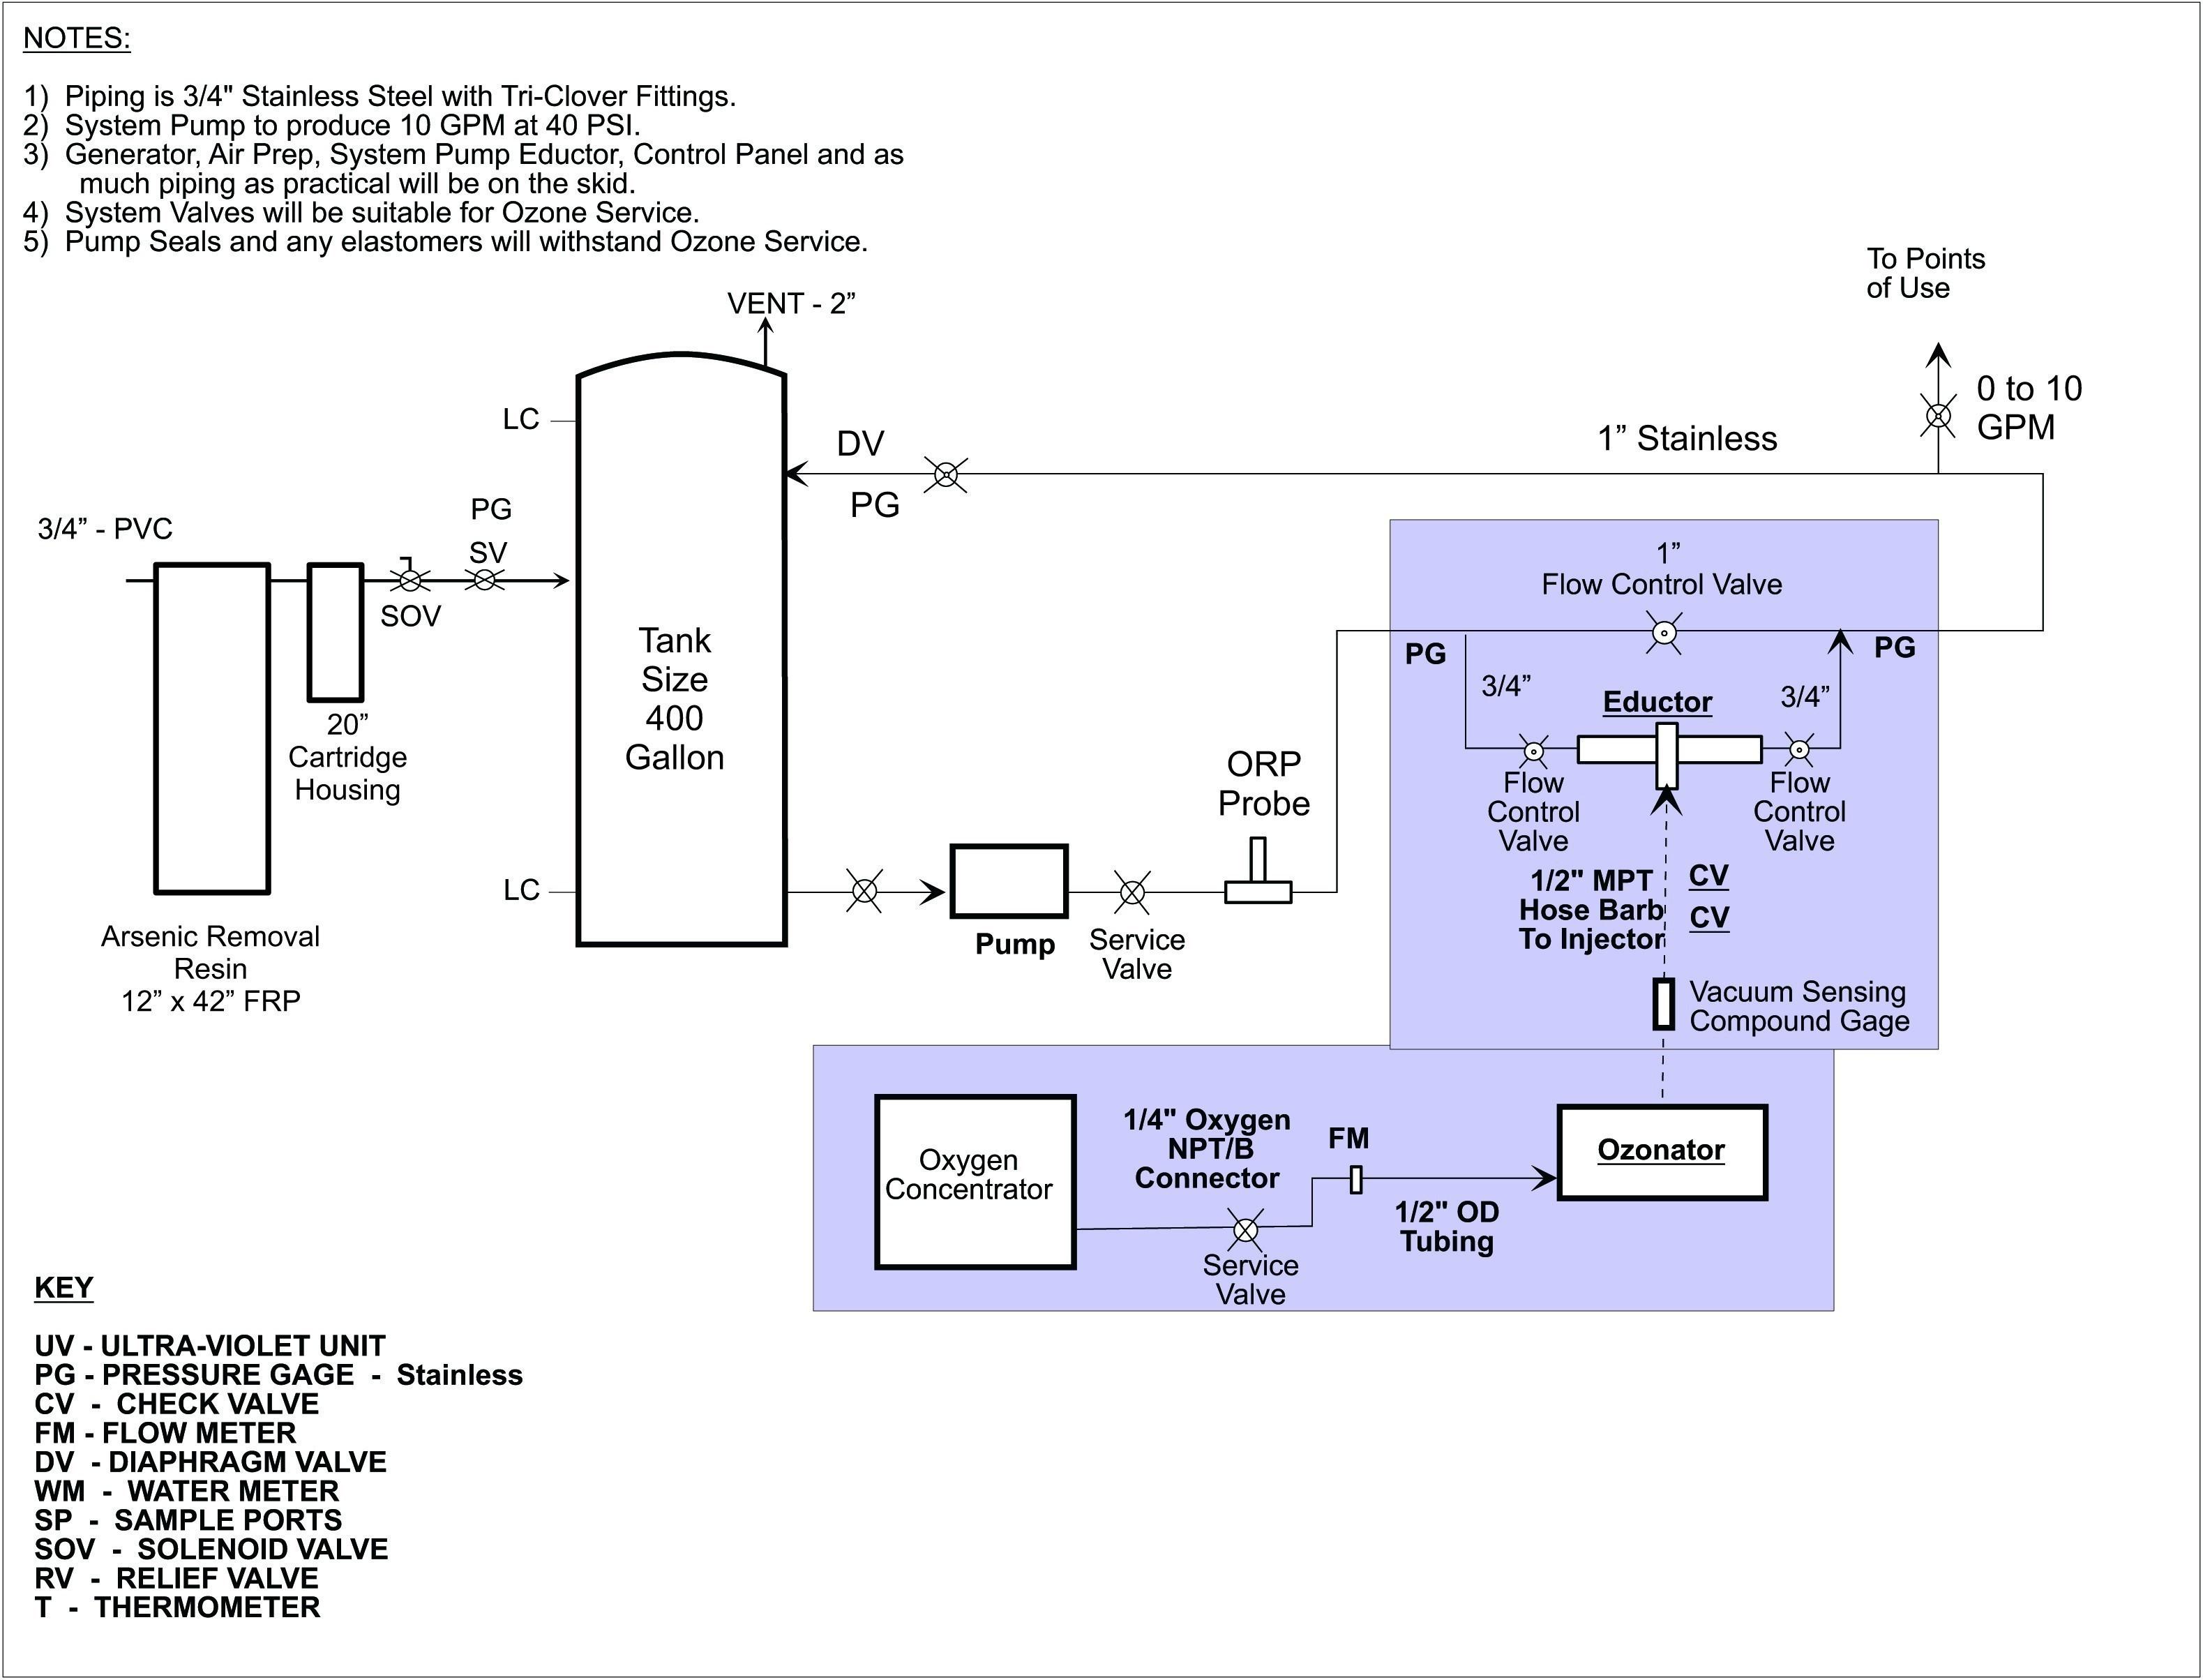 Wiring Diagram for Car Trailer Wiring Diagram for Car Trailer Plug Save Enclosed Trailer Wiring Of Wiring Diagram for Car Trailer